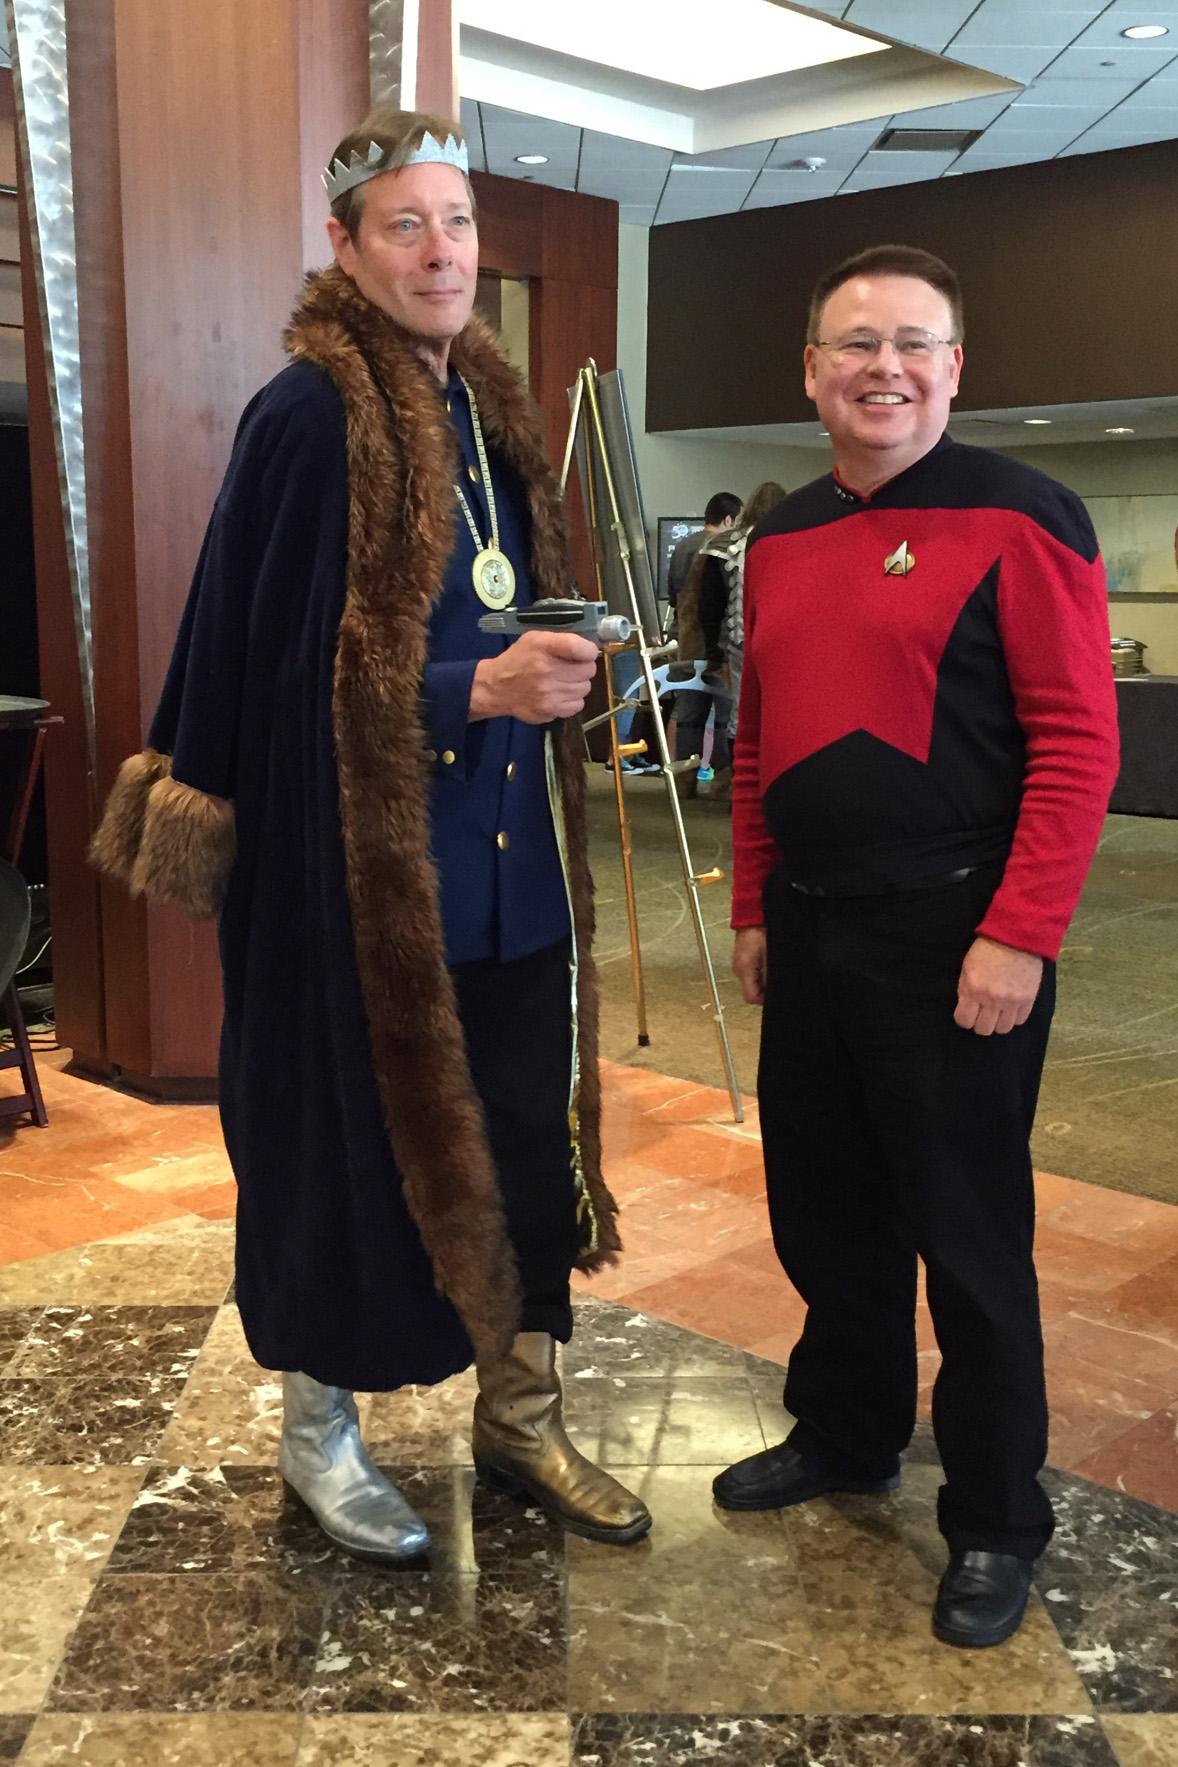 Star Trek Convention Mpls Lord Garth.jpg